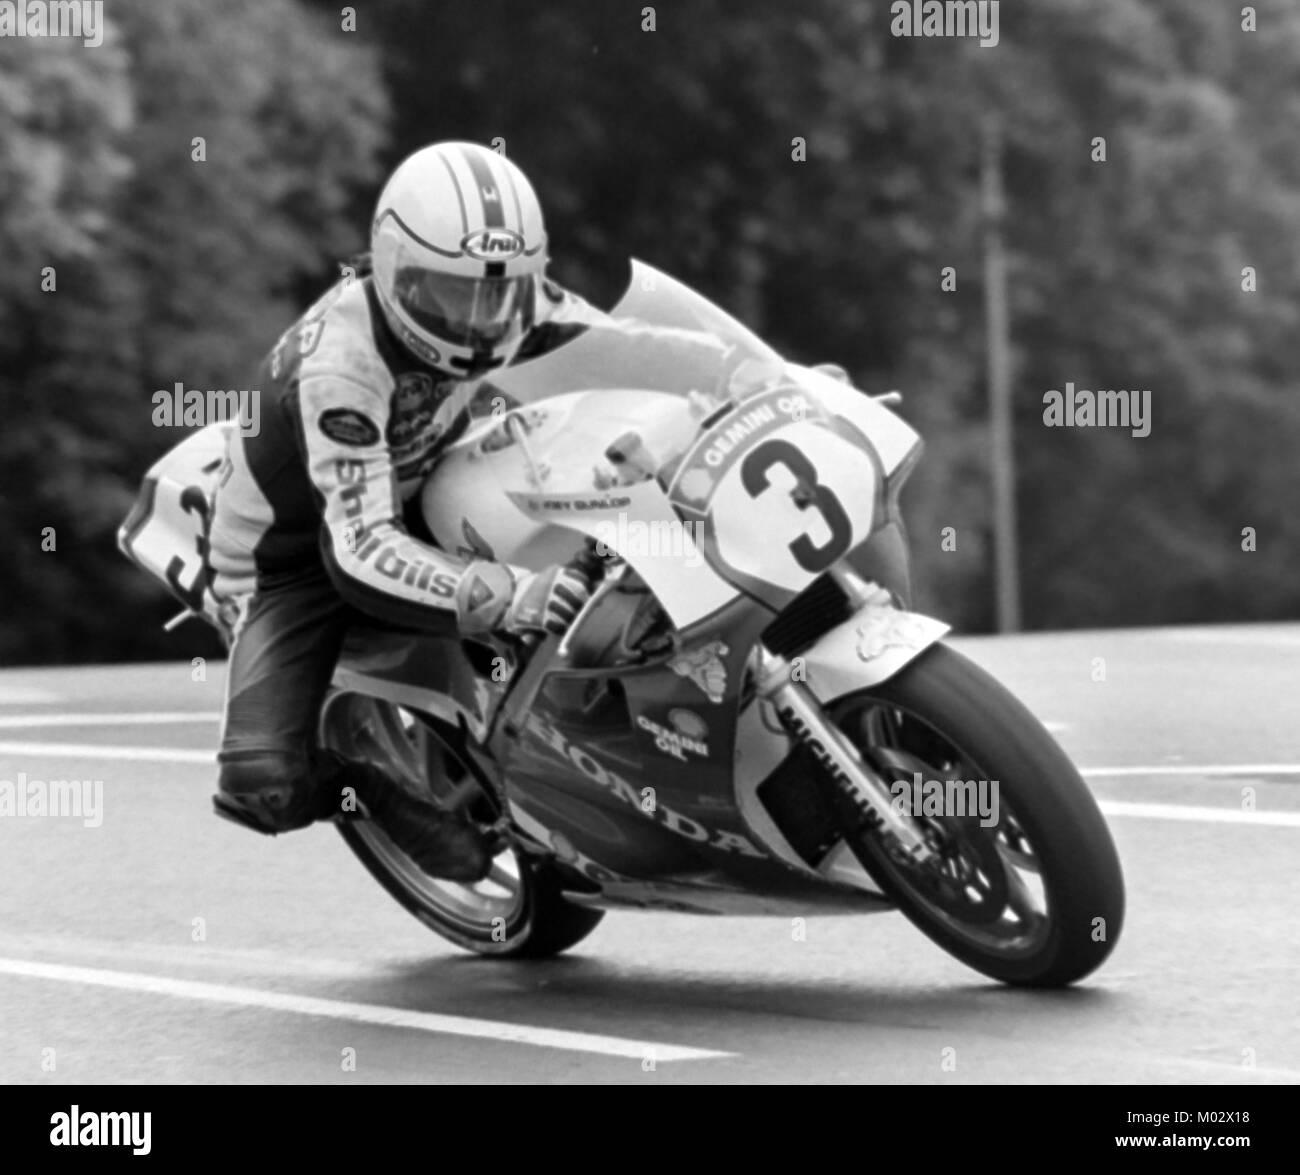 Joey Dunlop on a Honda on his way to winning the Formula 1 TT, June 1988, Isle of Man bhz - Stock Image